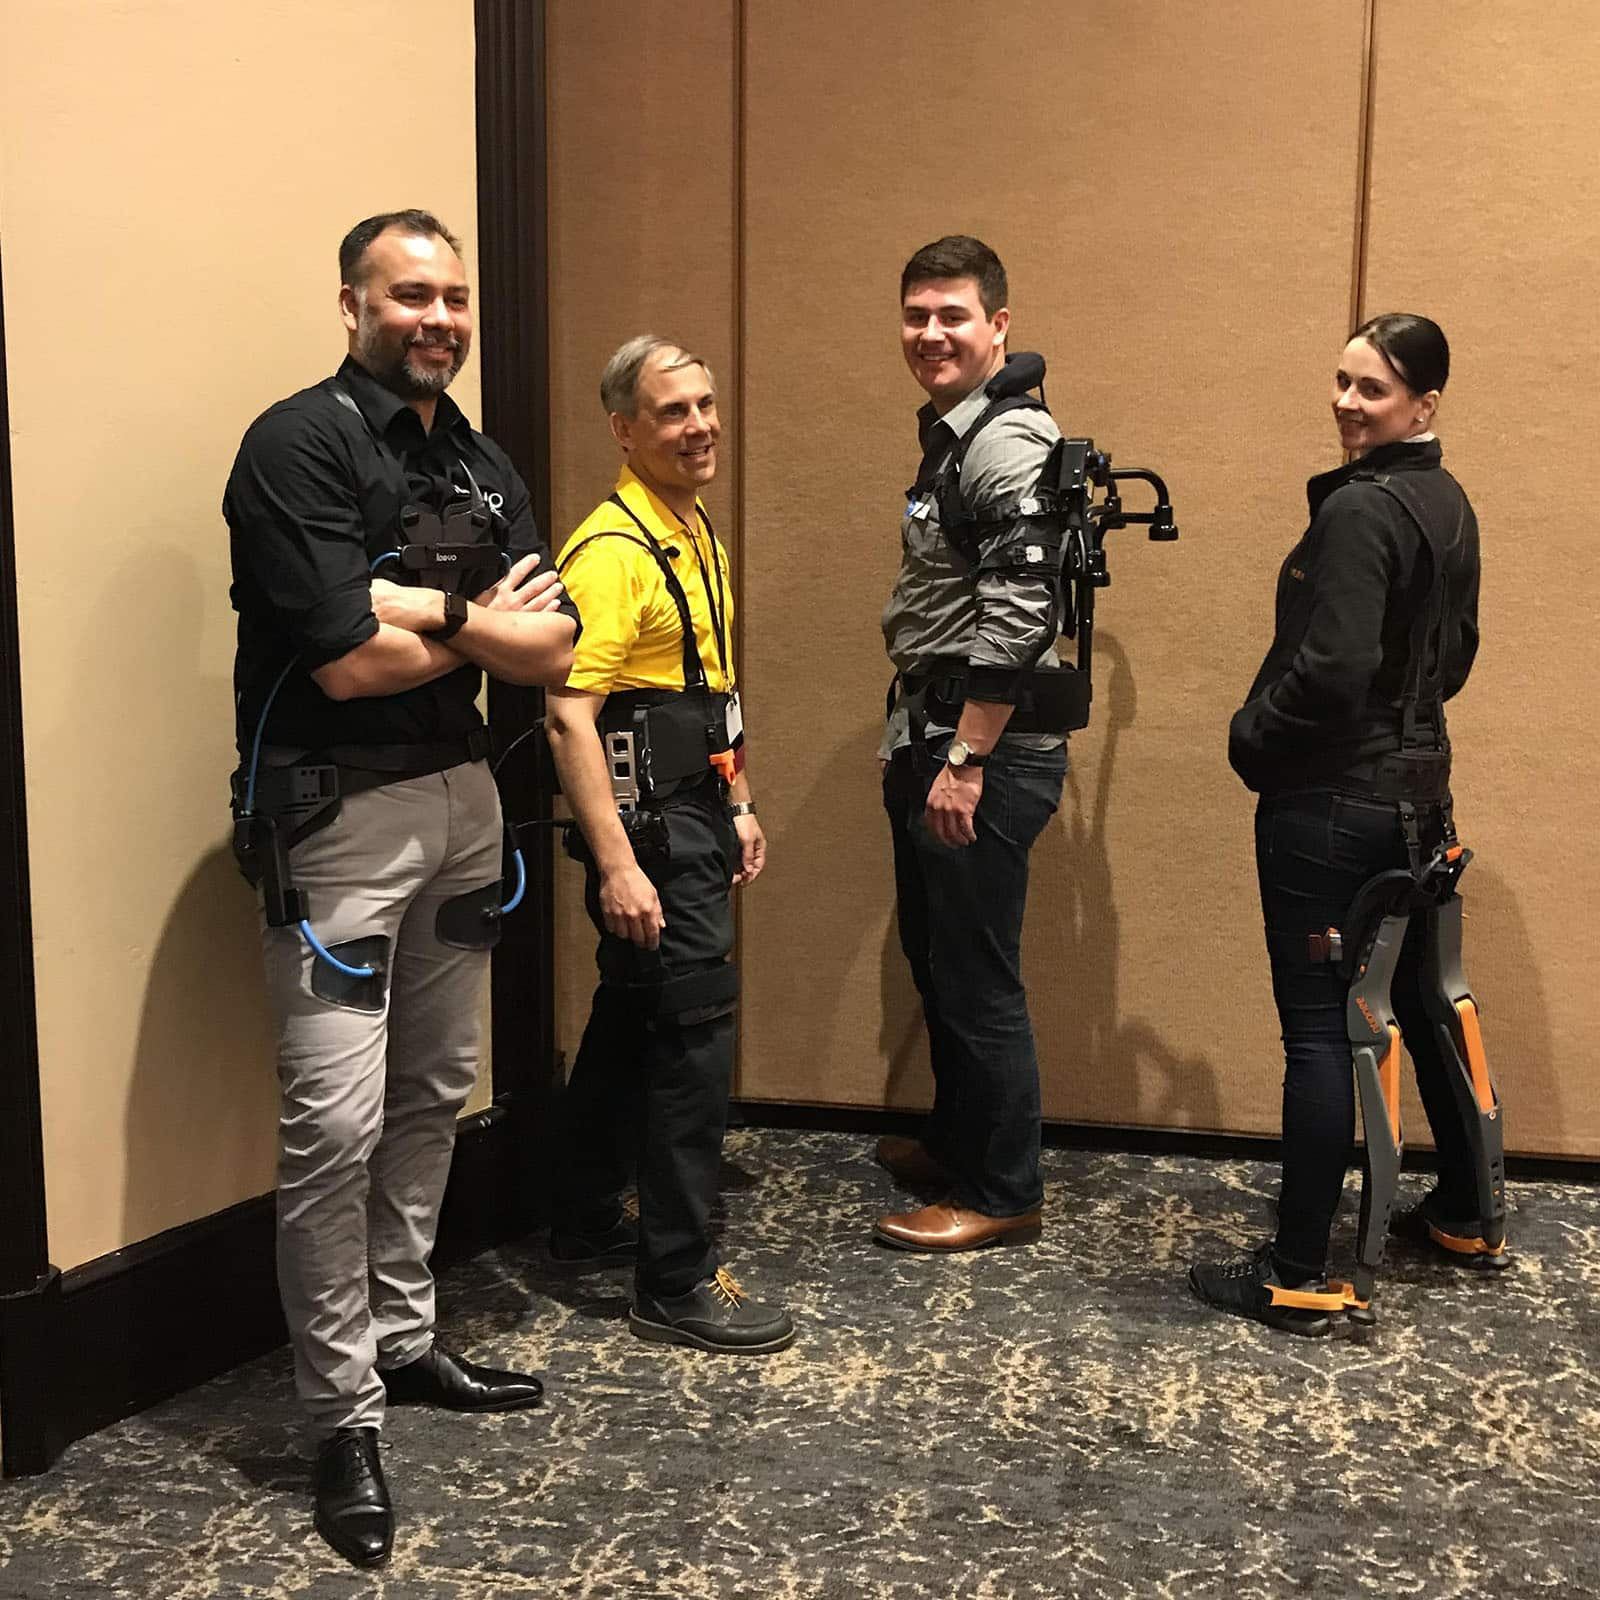 Representatives from Laevo, SpringActive, Ekso Bionics, and Noonee preparing for a presentation at WearRAcon18